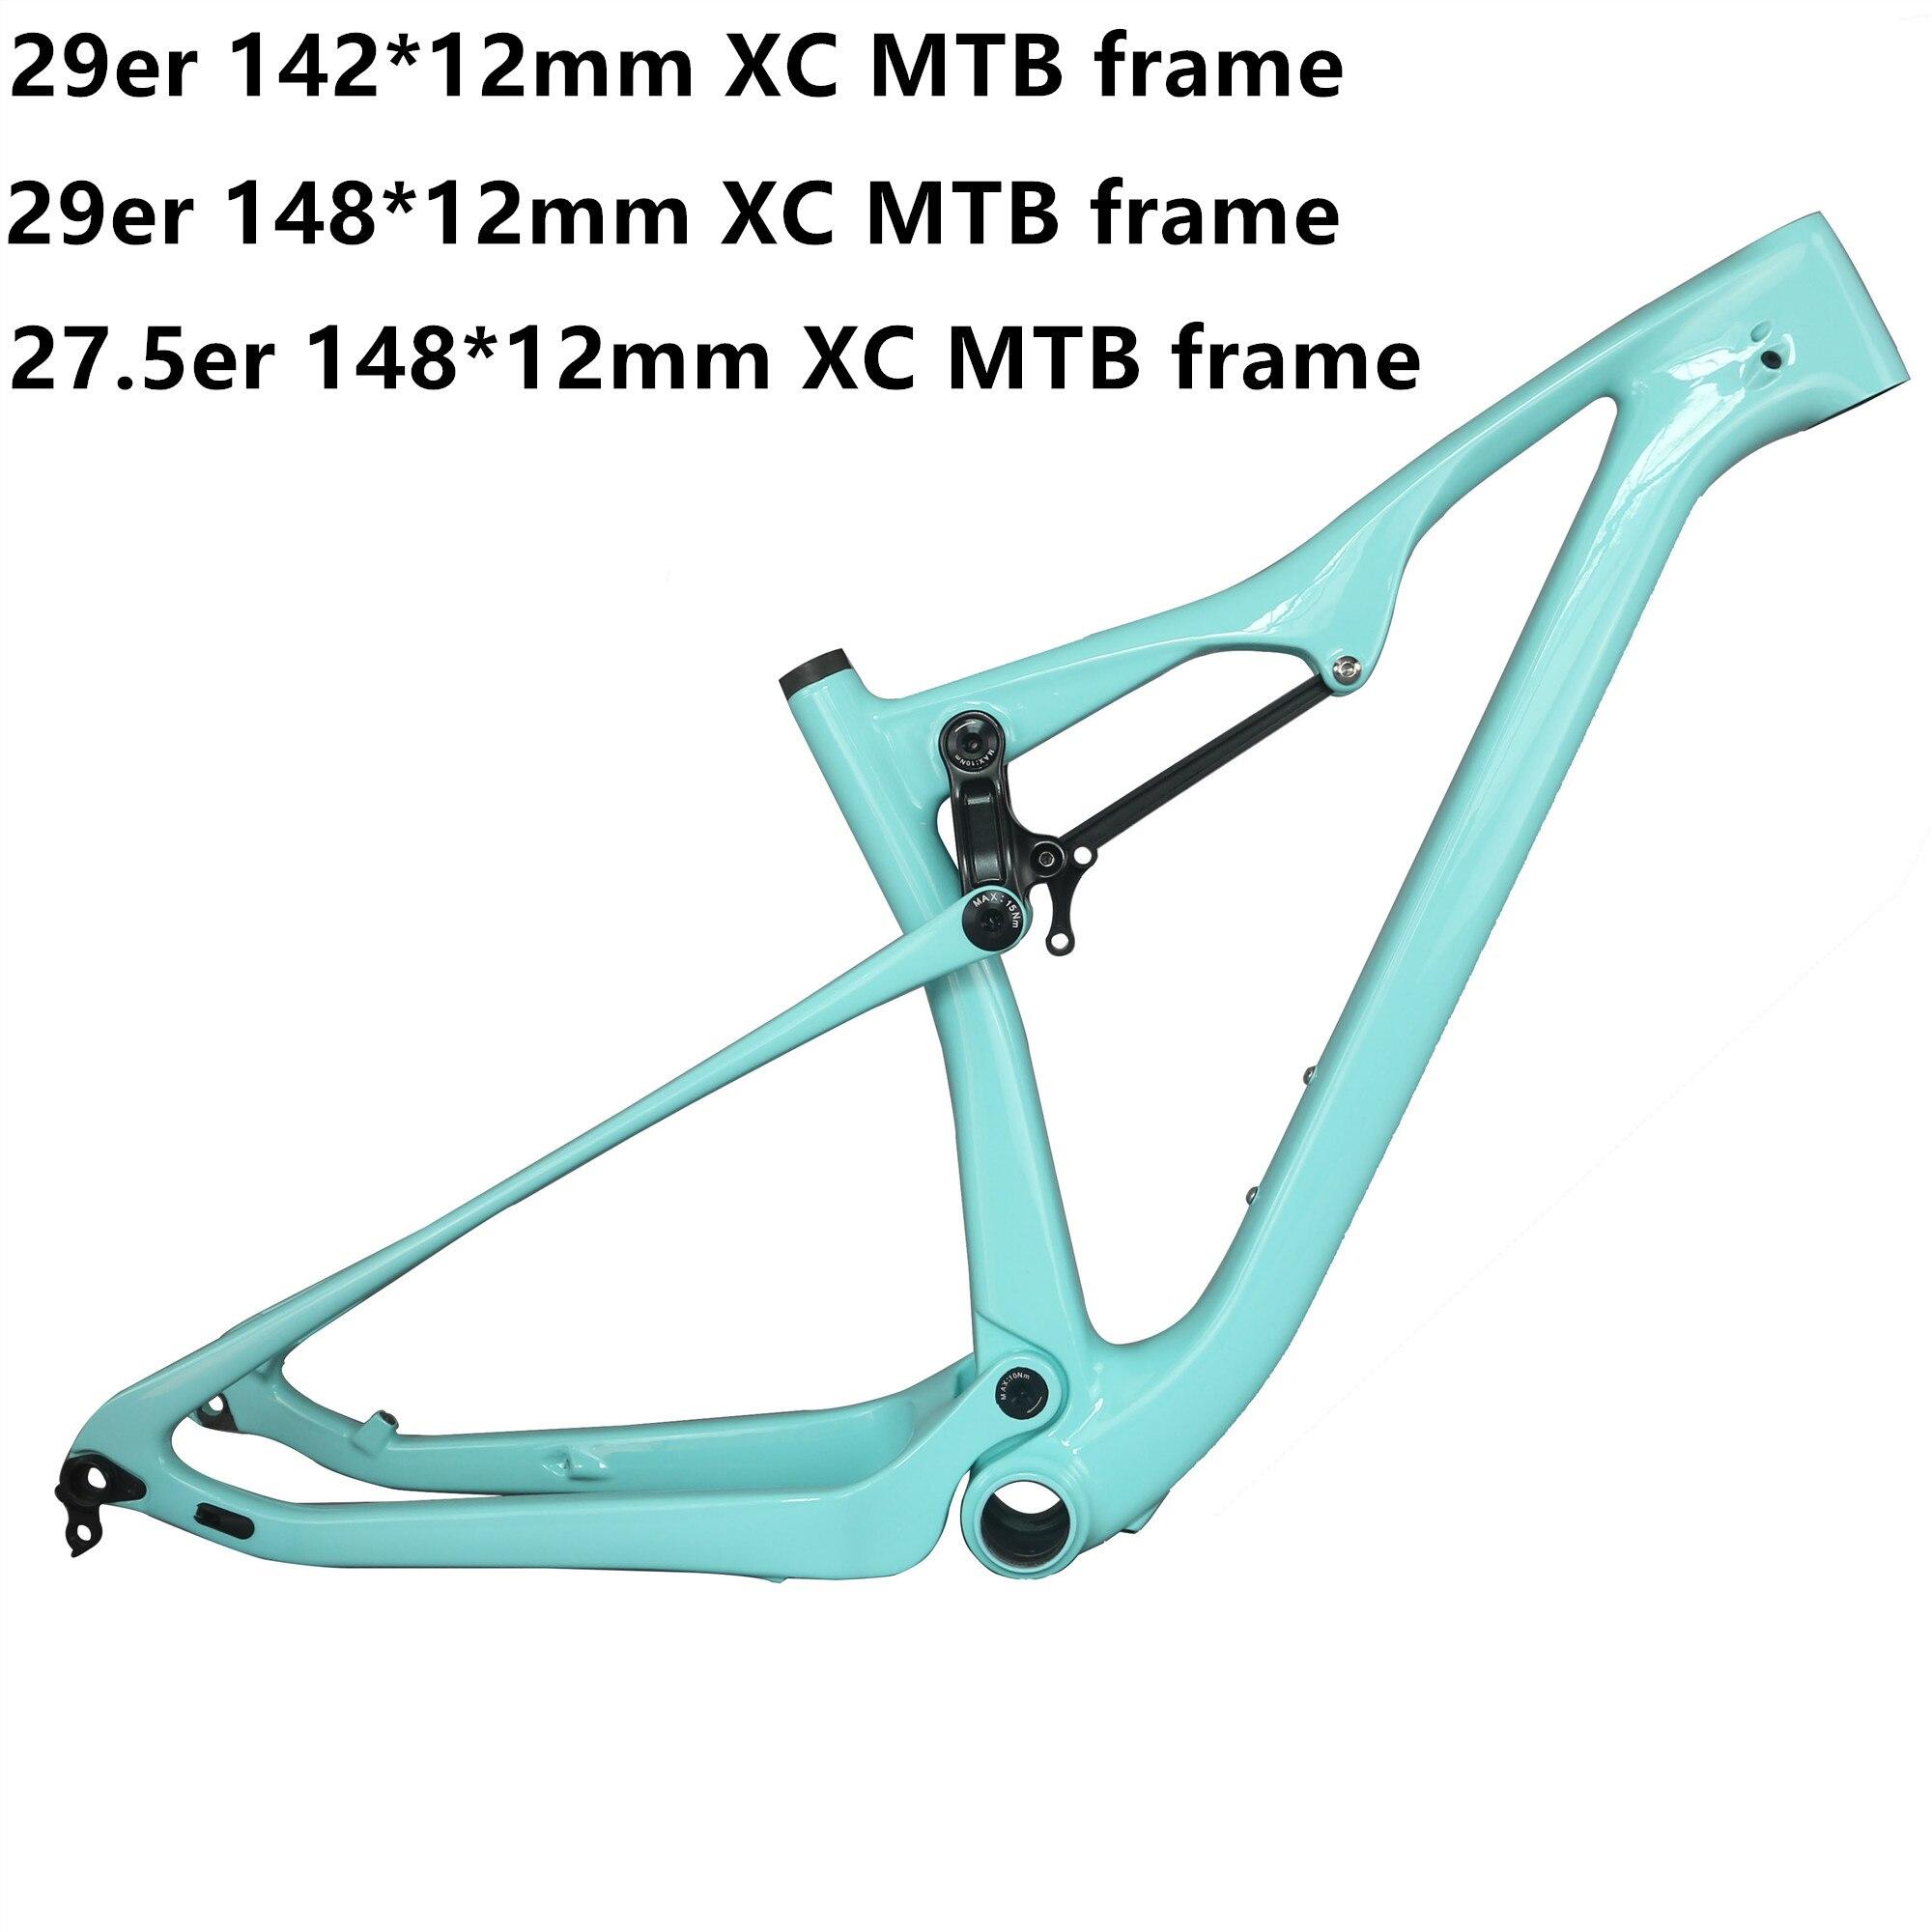 2020 Custom Paint 29er XC Mtb Frame ,27.5er Boost XC Mtb Frame ,29er Boost XC Mtb Frame BB92 Frame FM06